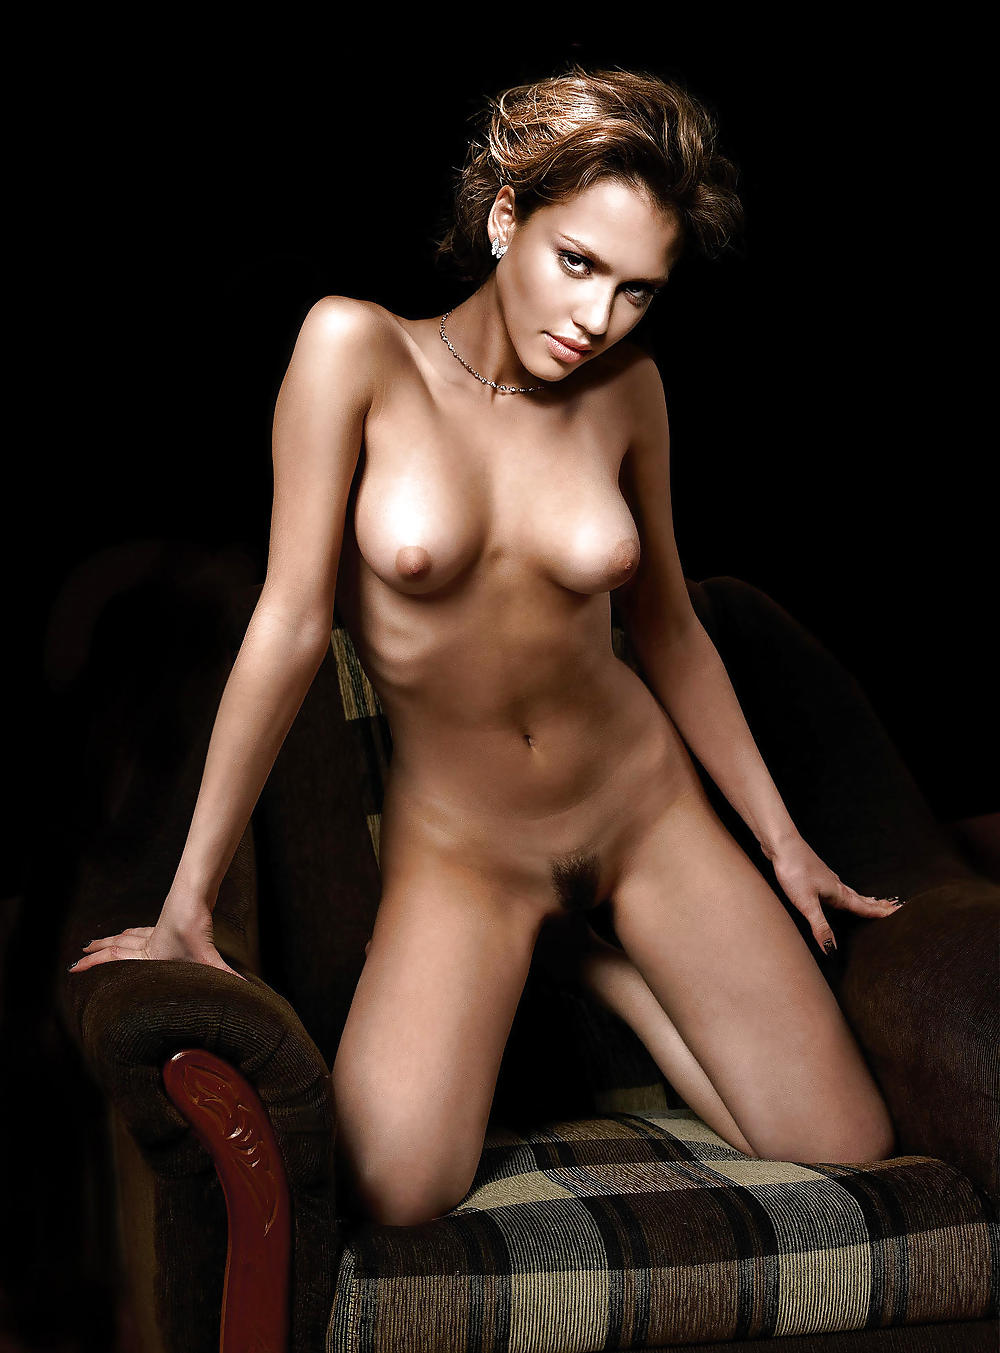 Jessica Alba Fakes - 5 Pics - Xhamstercom-3925